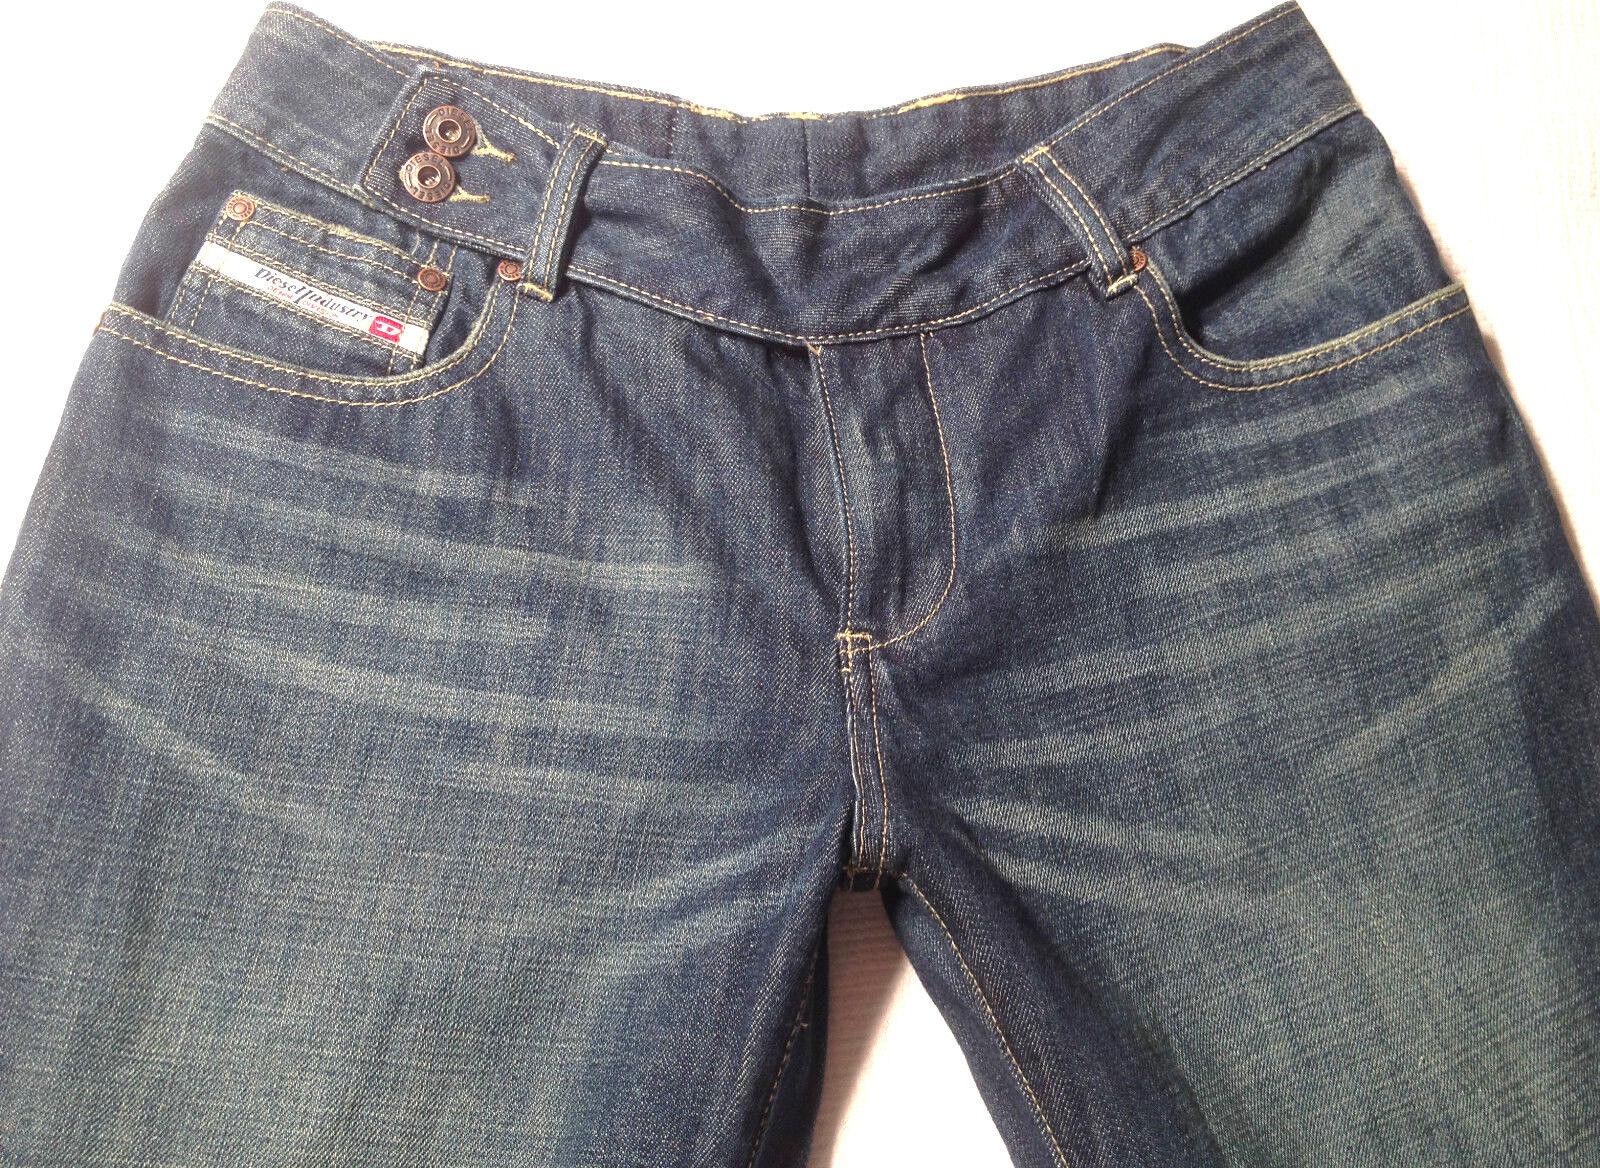 Diesel Jeans 'Rame' Indigo Jeans W30 L32 AU 12 RRP  289 Womens